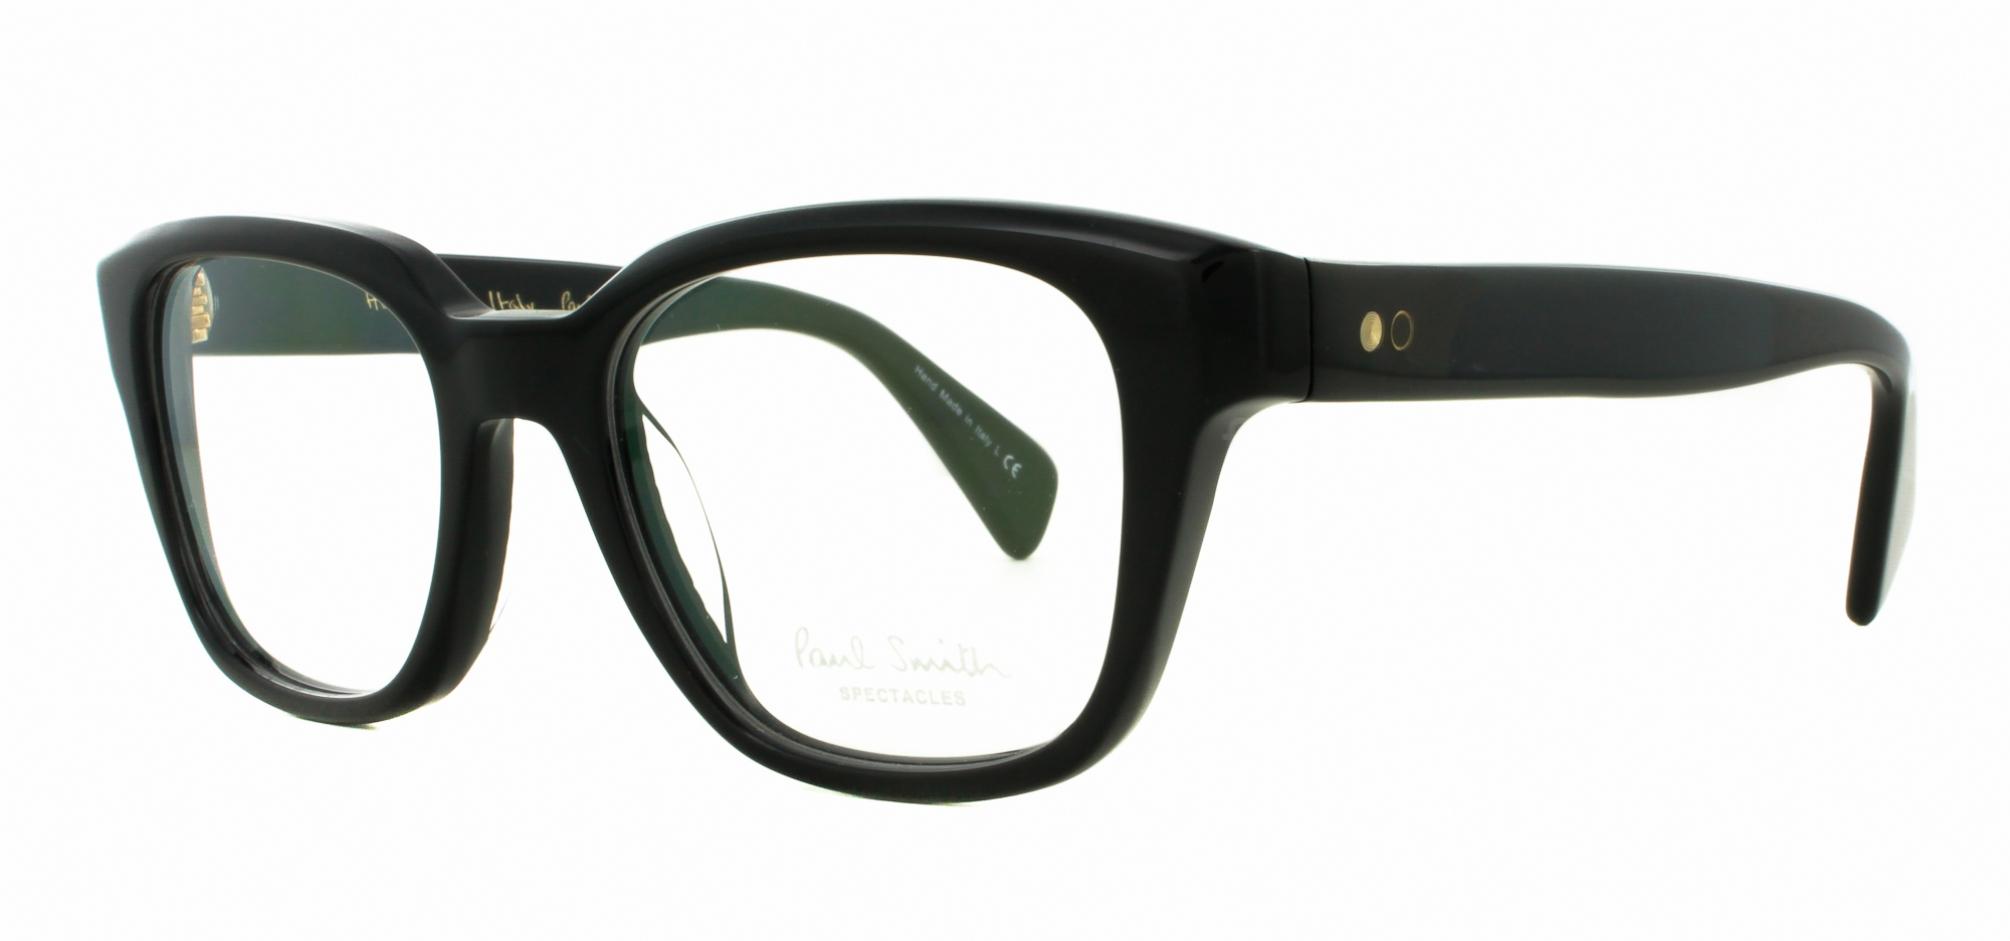 7275966eb4 Buy Paul Smith Eyeglasses directly from OpticsFast.com